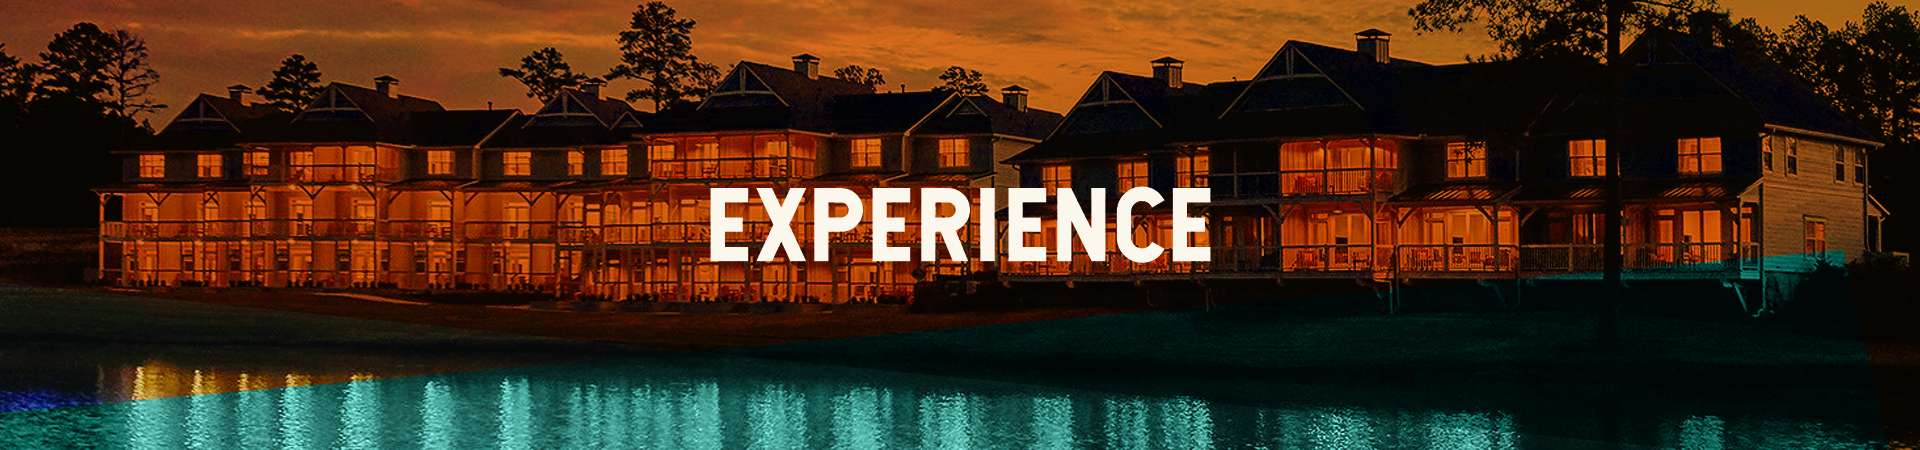 Experience Web Banner, Foxhall Resort villas